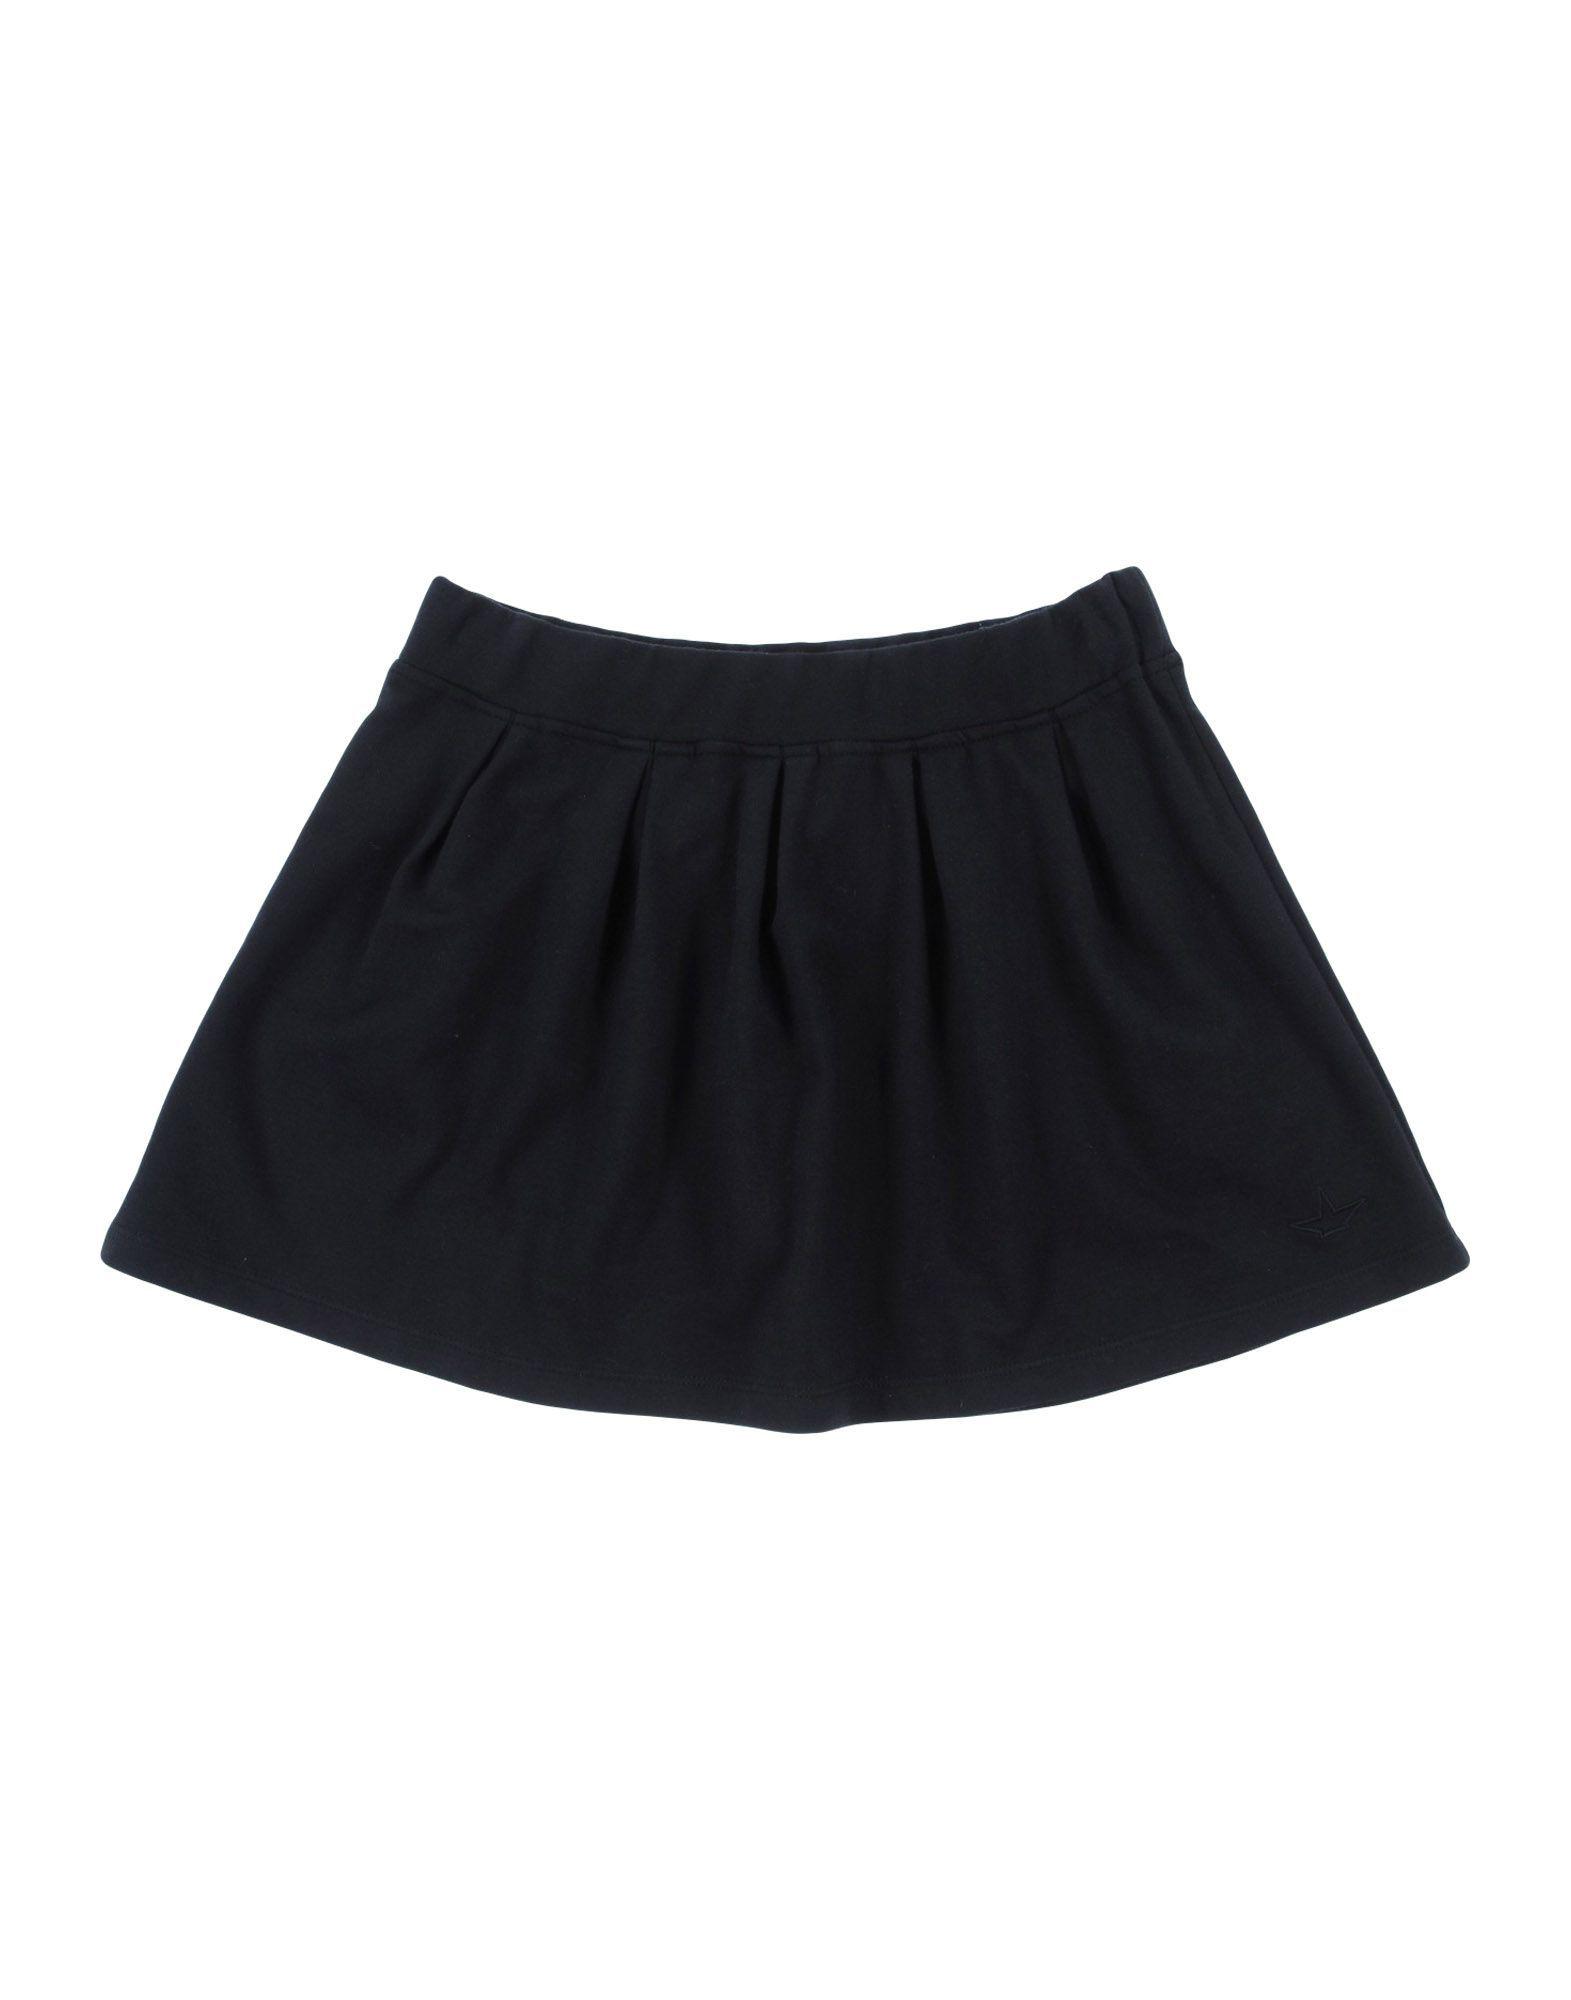 Macchia J Black Girls' Cotton Skirt